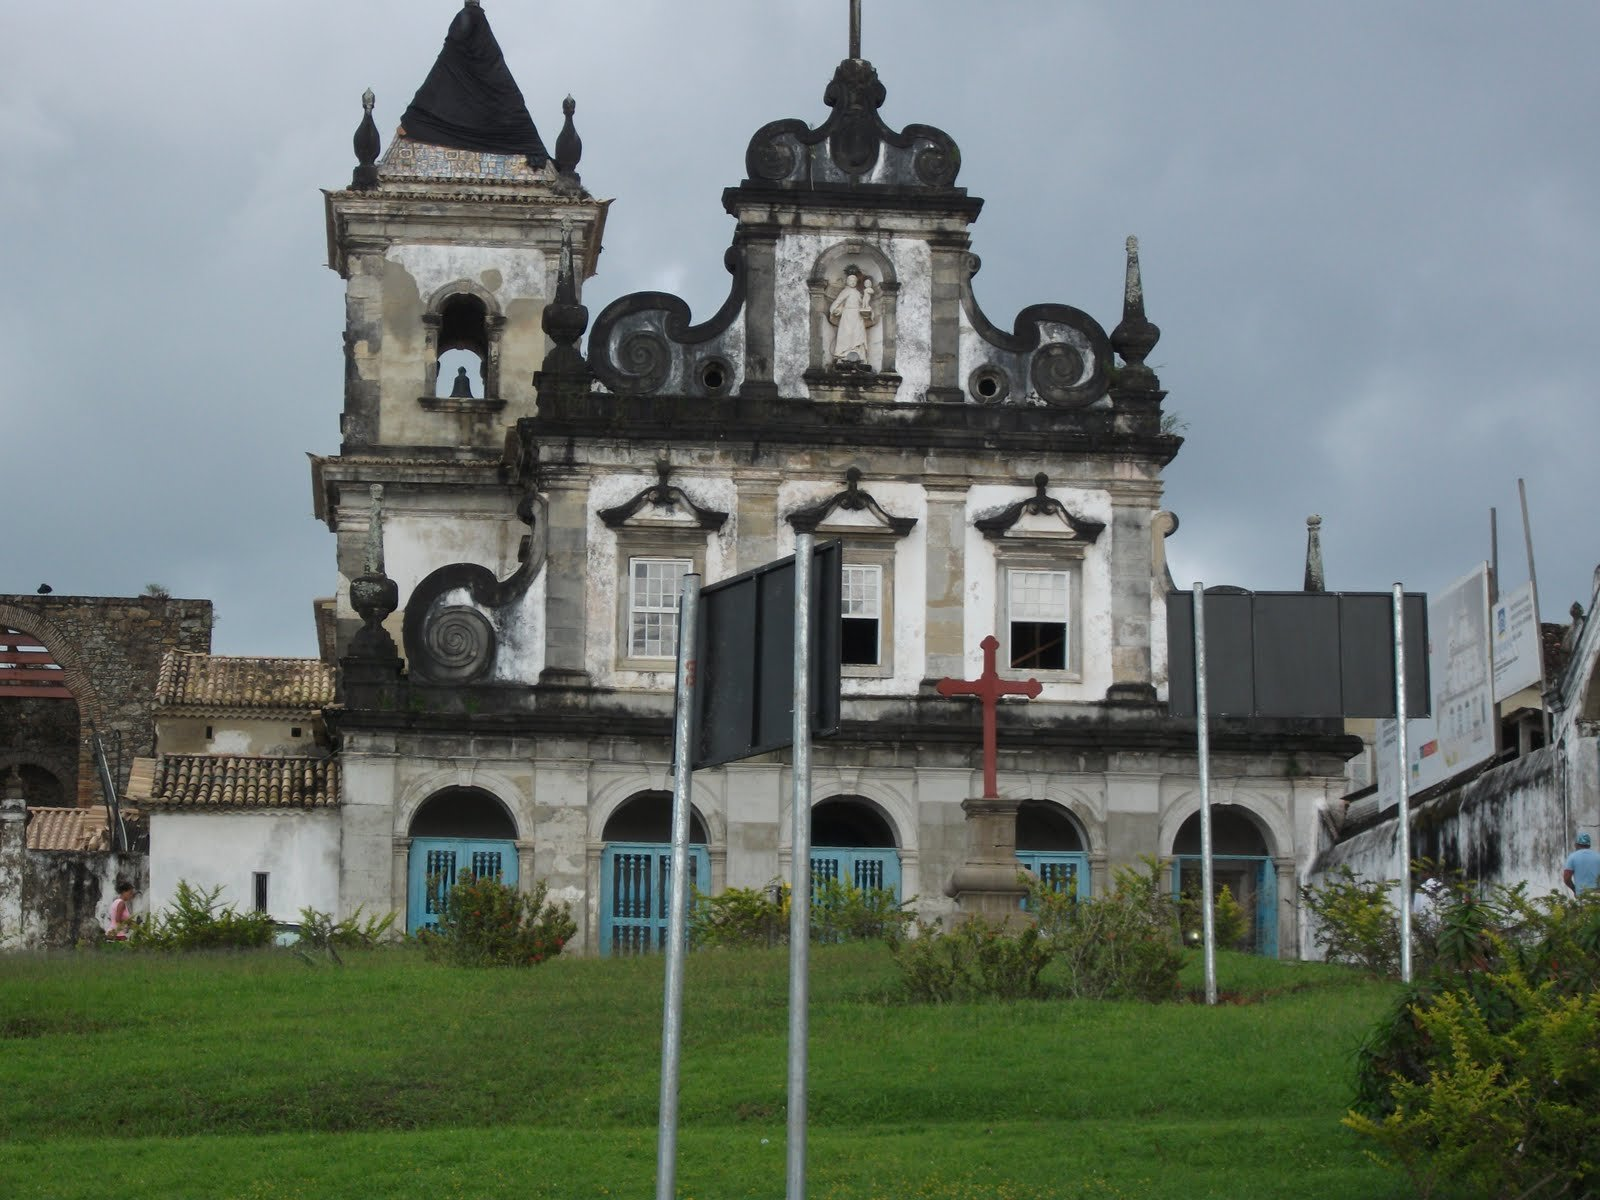 arquitetura barroca no Brasil